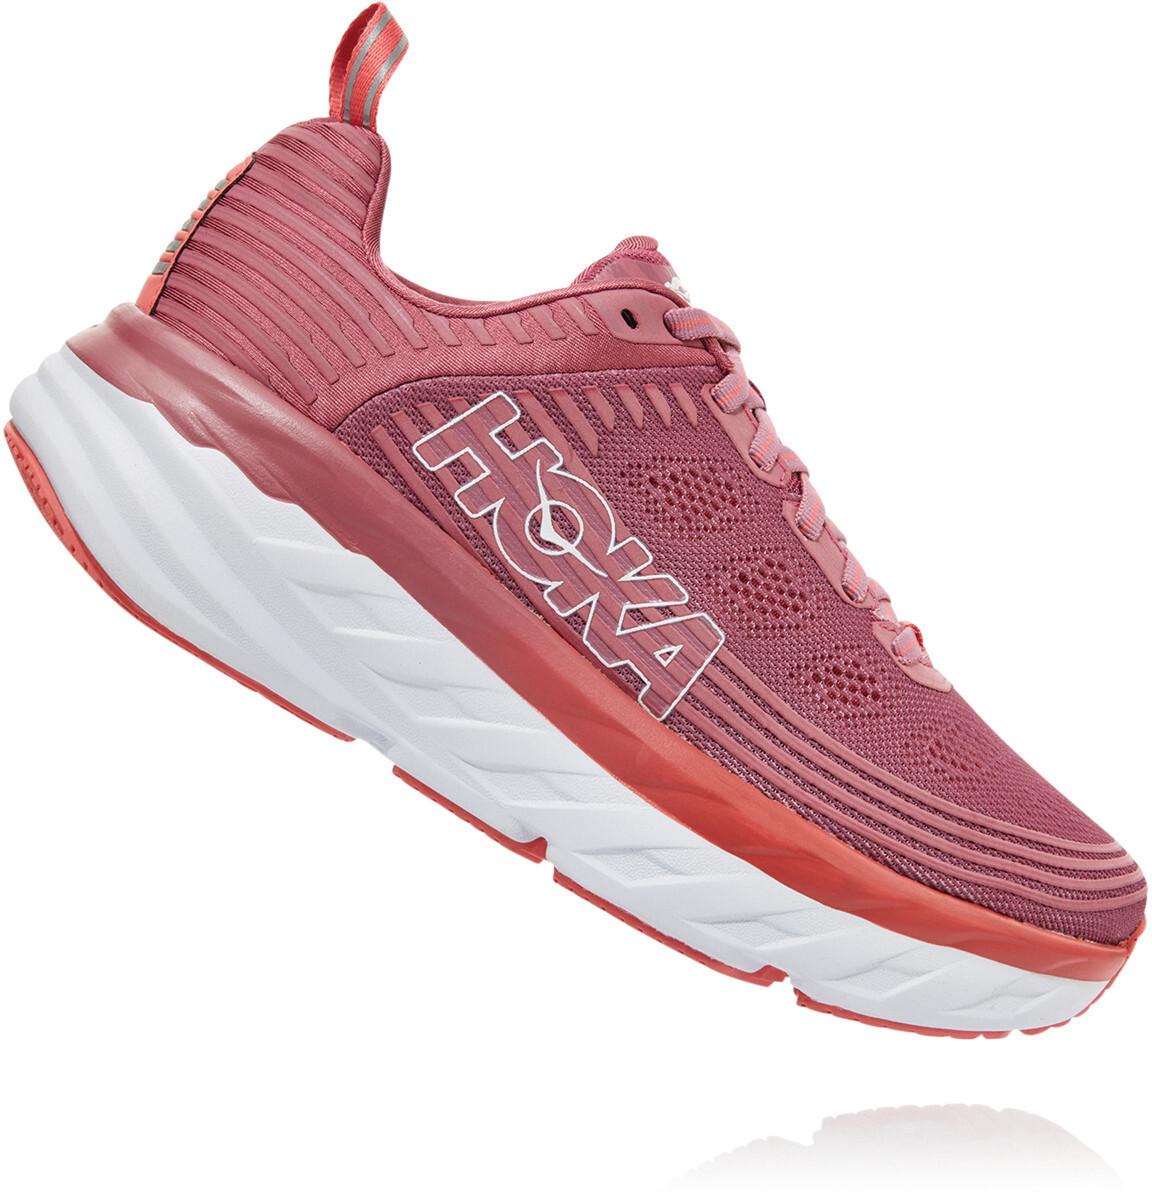 Hoka One One Bondi 6 Running Shoes Dame mood indigodusty pink